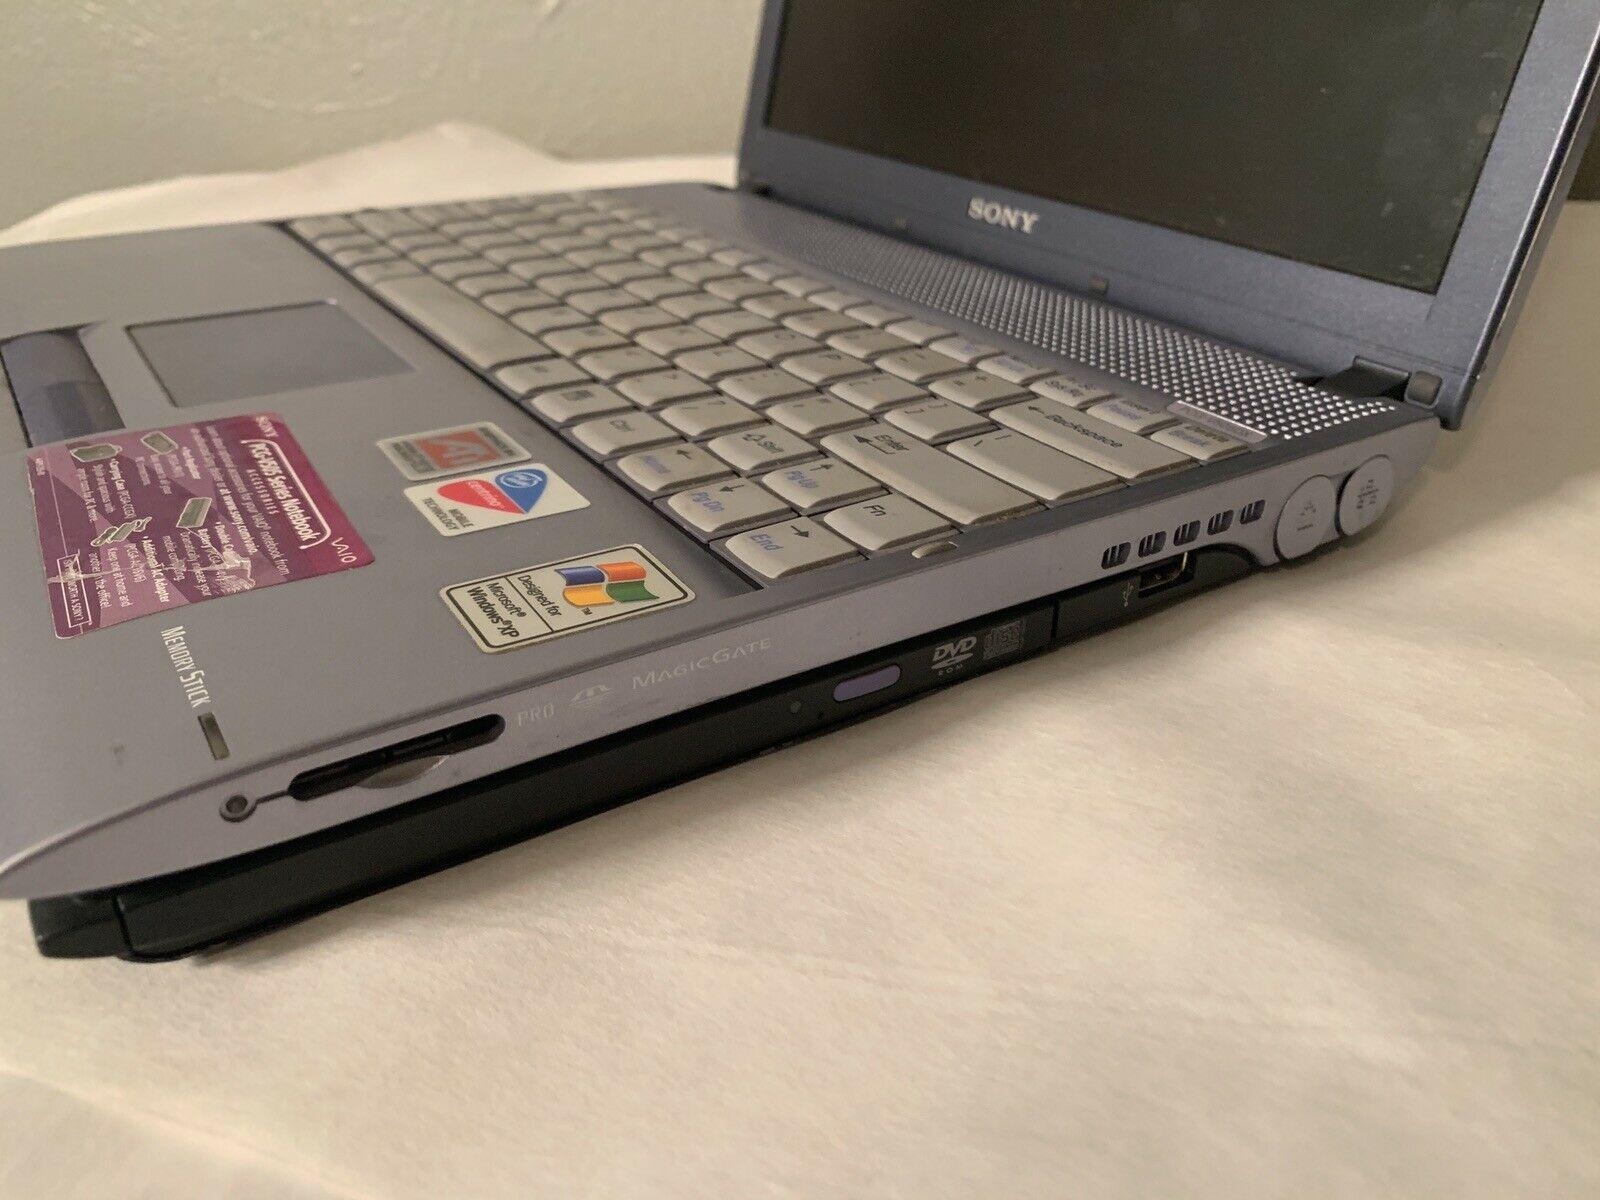 Installing Linux on Sony Vaio PCG-V505BX Laptop